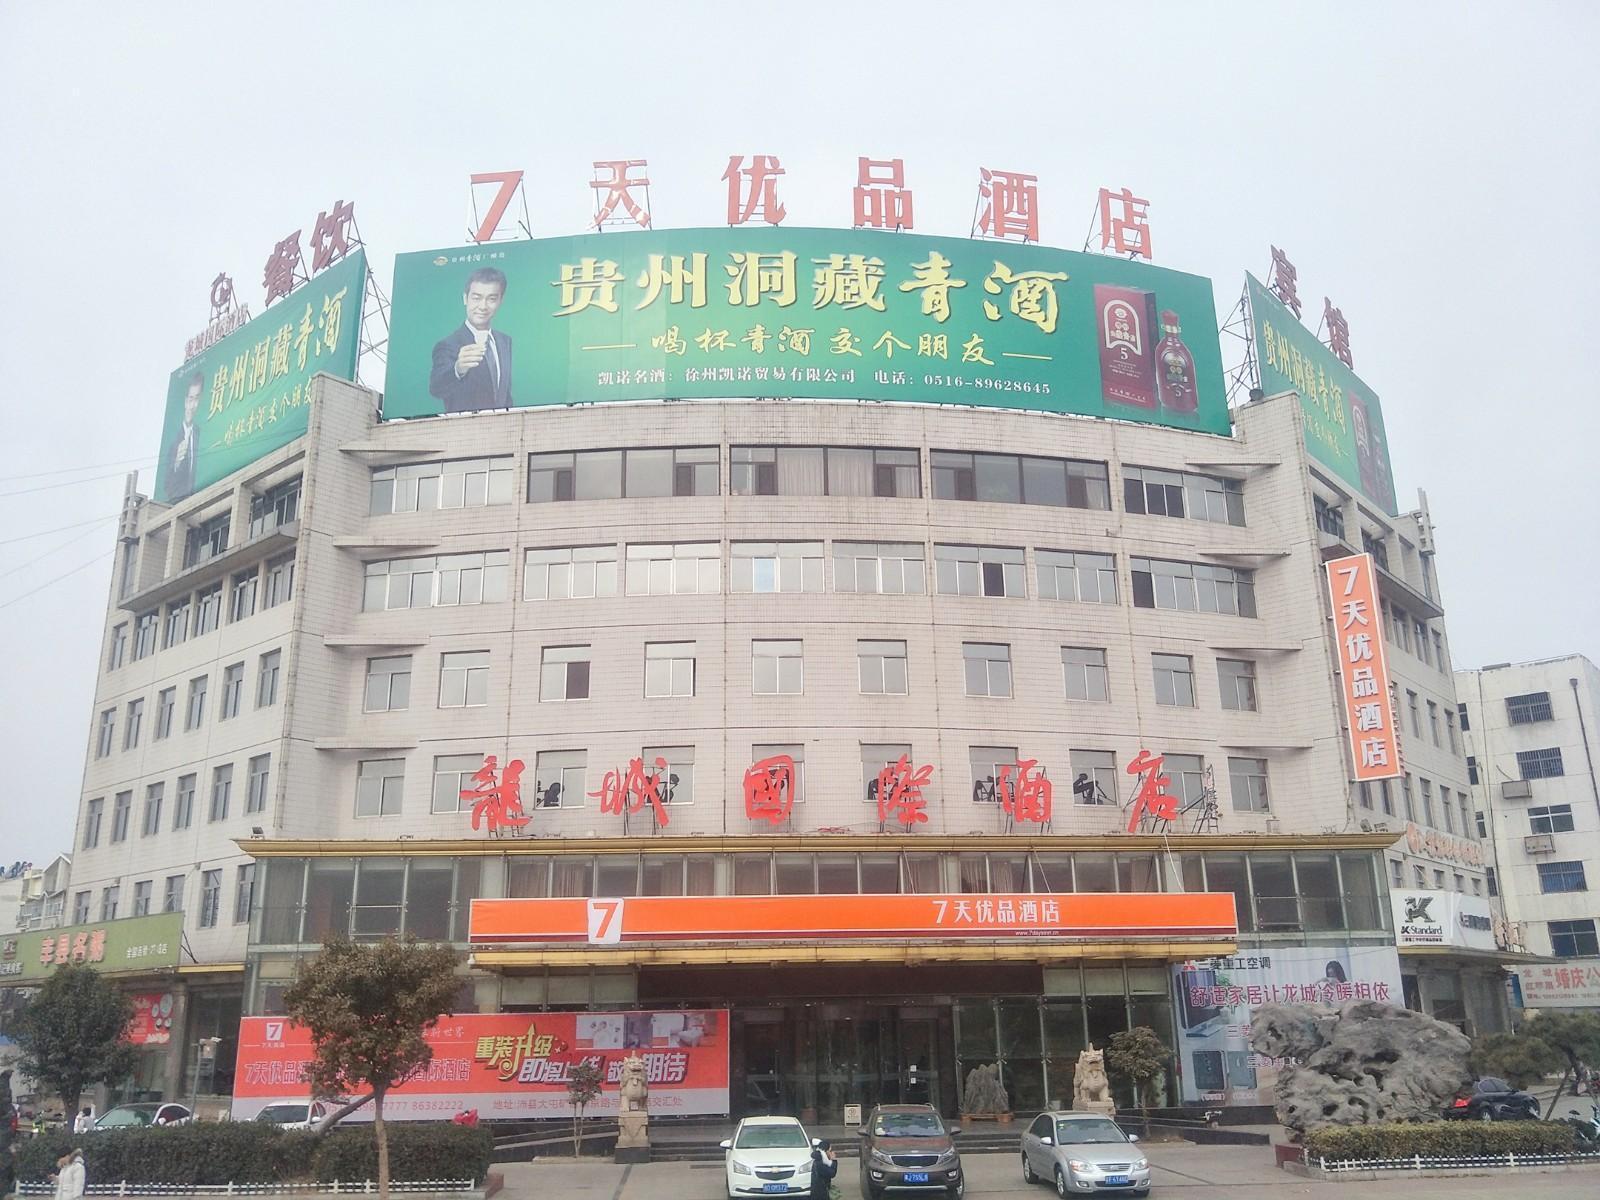 7 Days Premium�Hotel Pei County Longcheng International